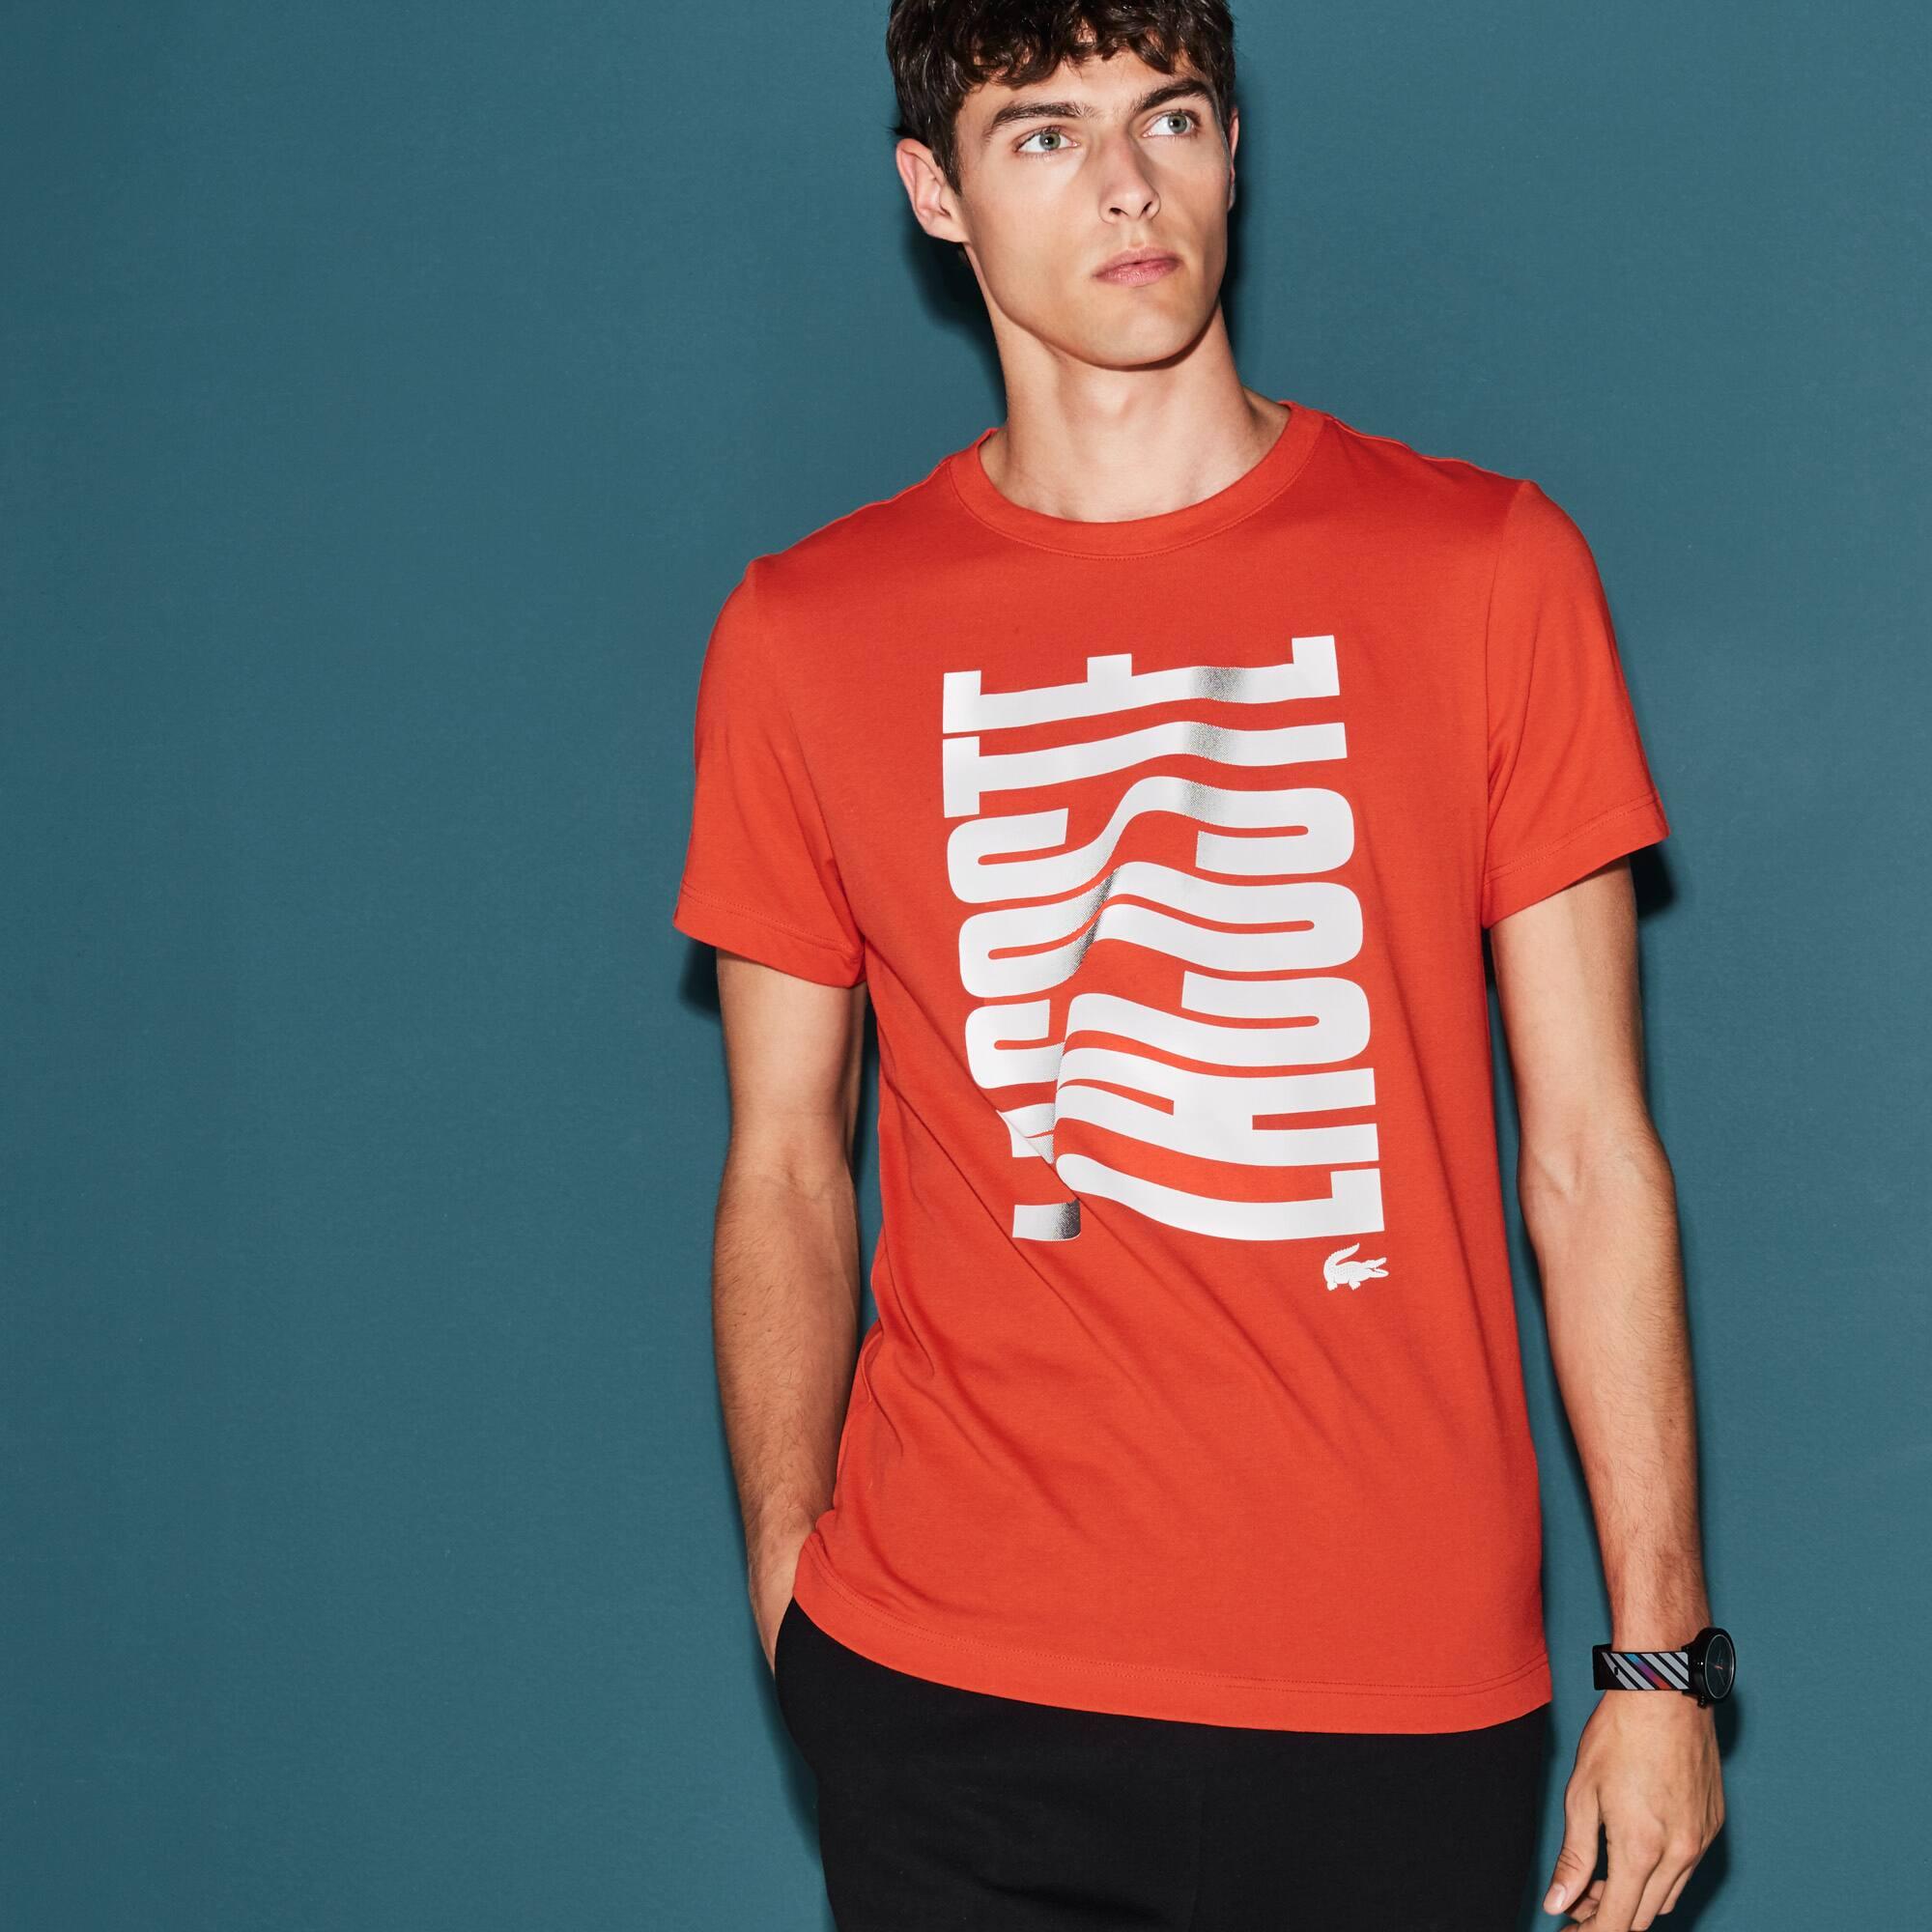 Men's Lacoste SPORT Tennis Lacoste Print Tech Jersey T-shirt